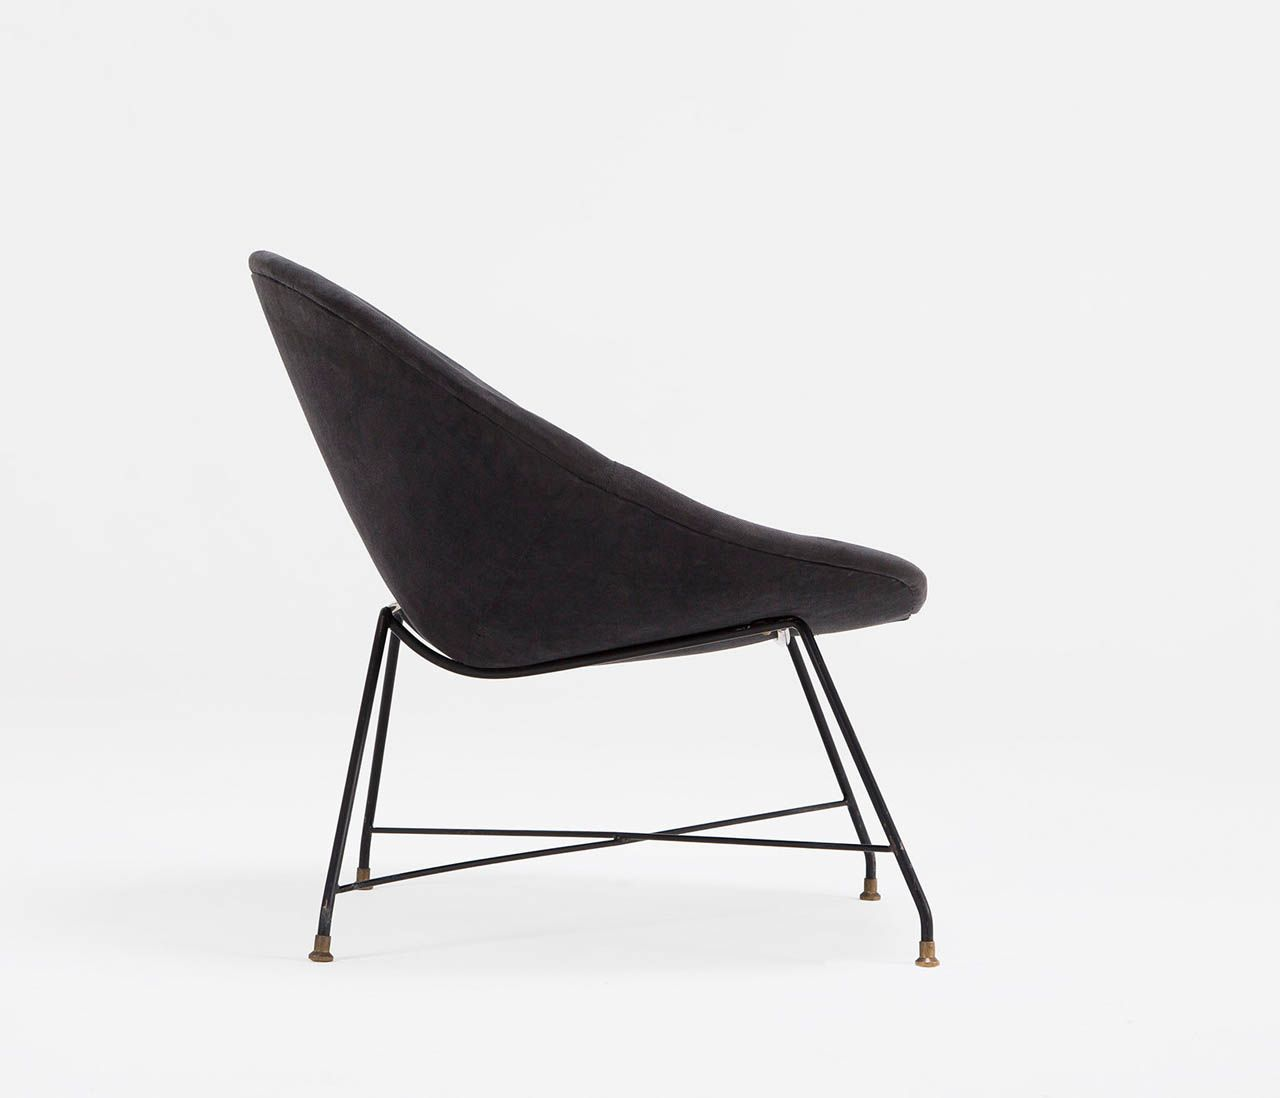 Augusto Bozzi Lounge Chair For Saporiti, Italy 1950s